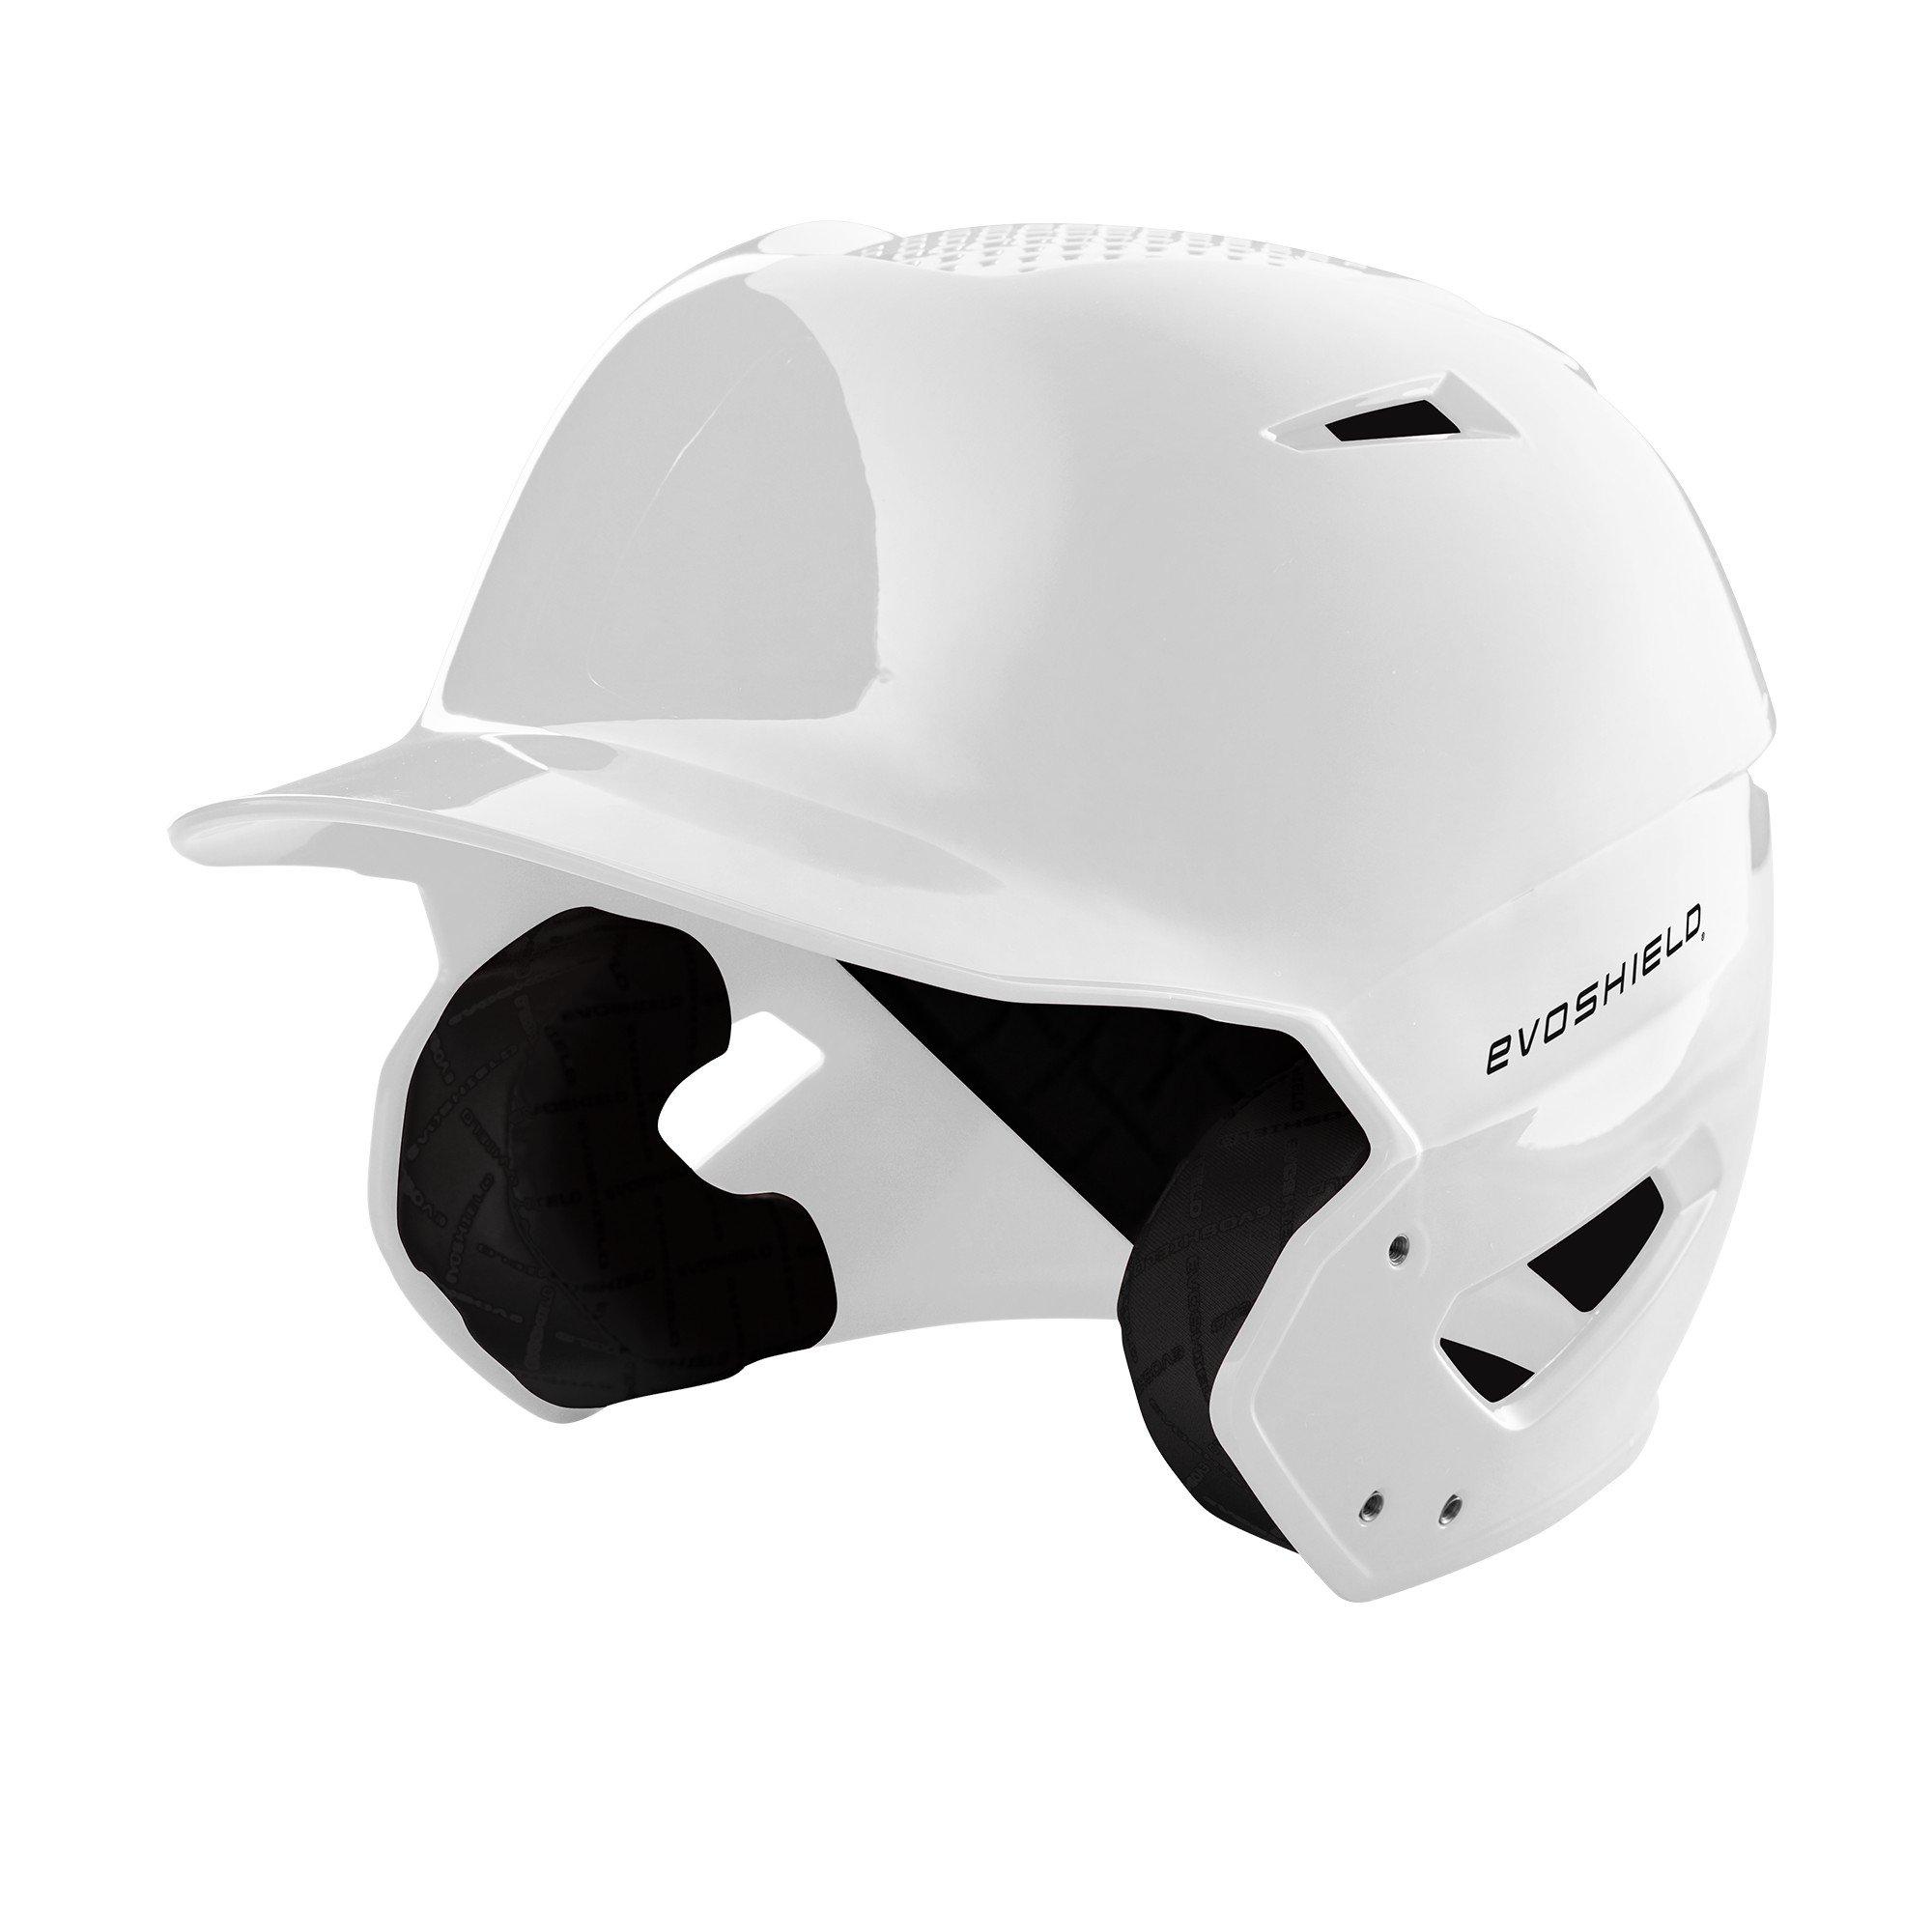 EvoShield XVT Batting Helmet, White - S-M by EvoShield